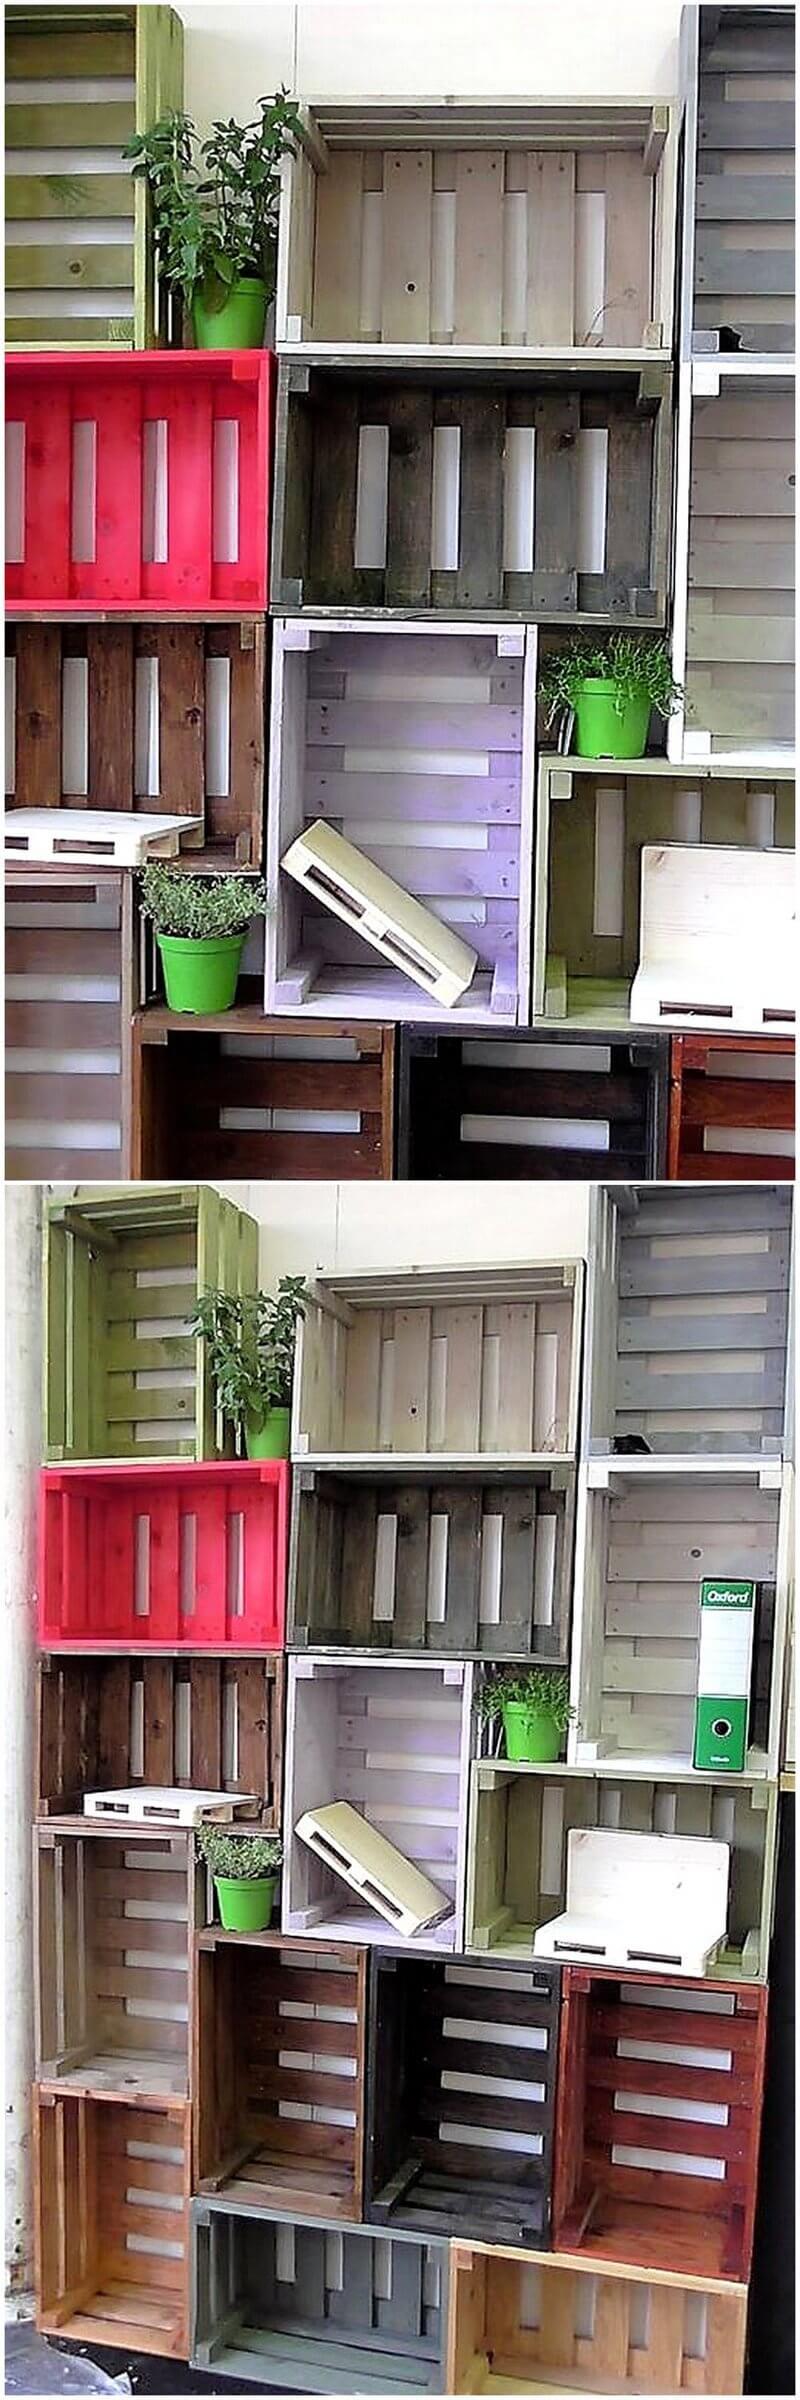 pallet fruit crates shelving